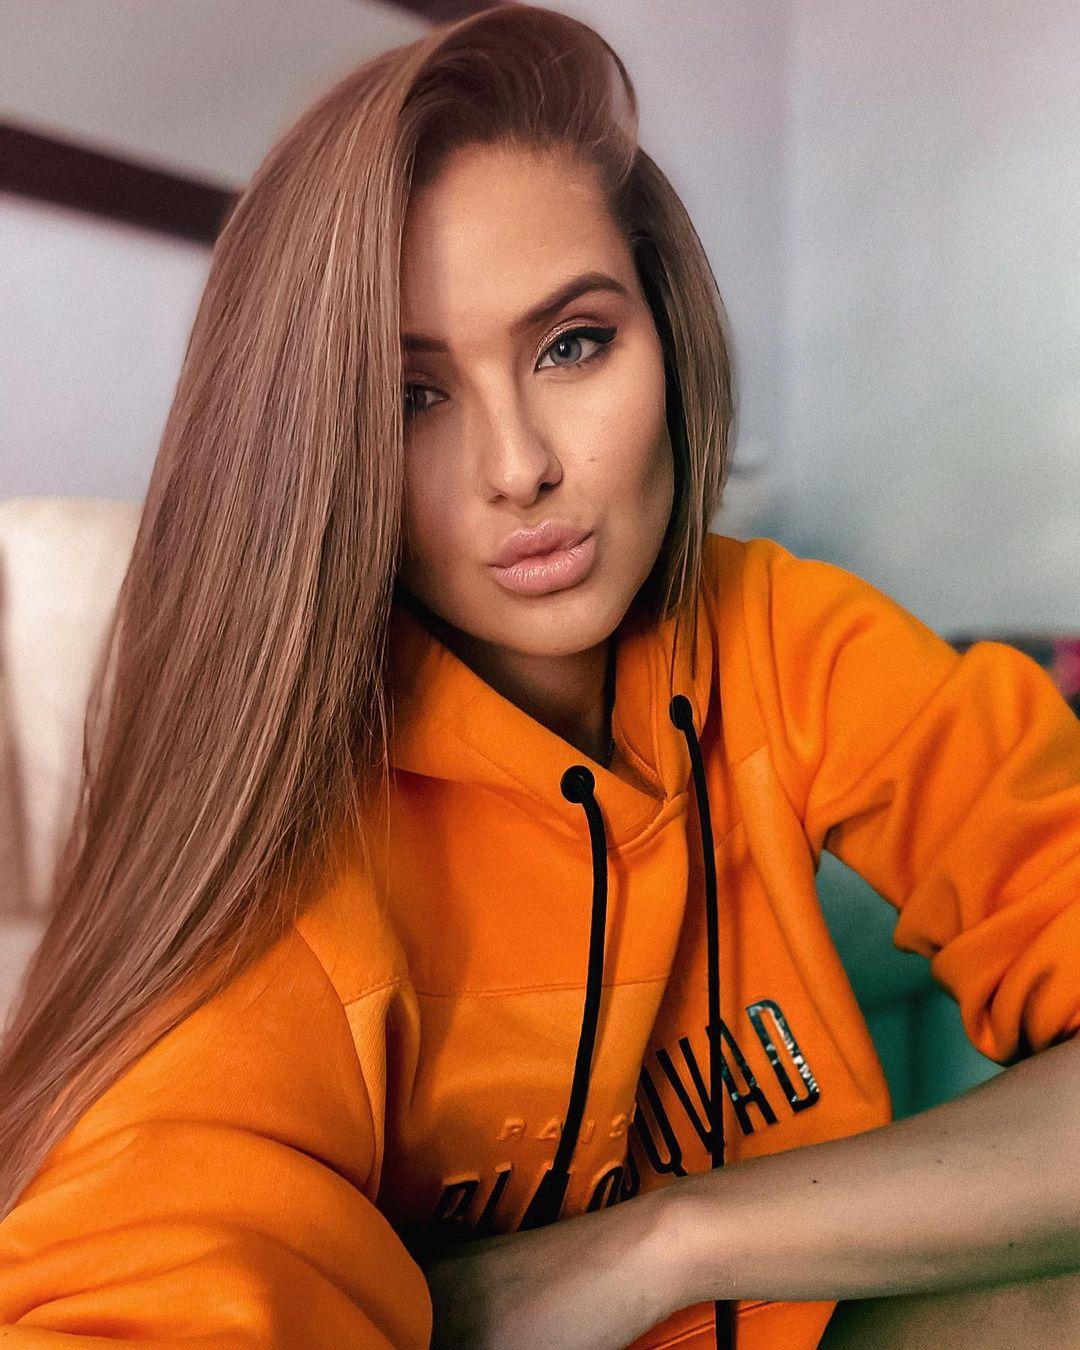 Liana-Vasilisinova-6